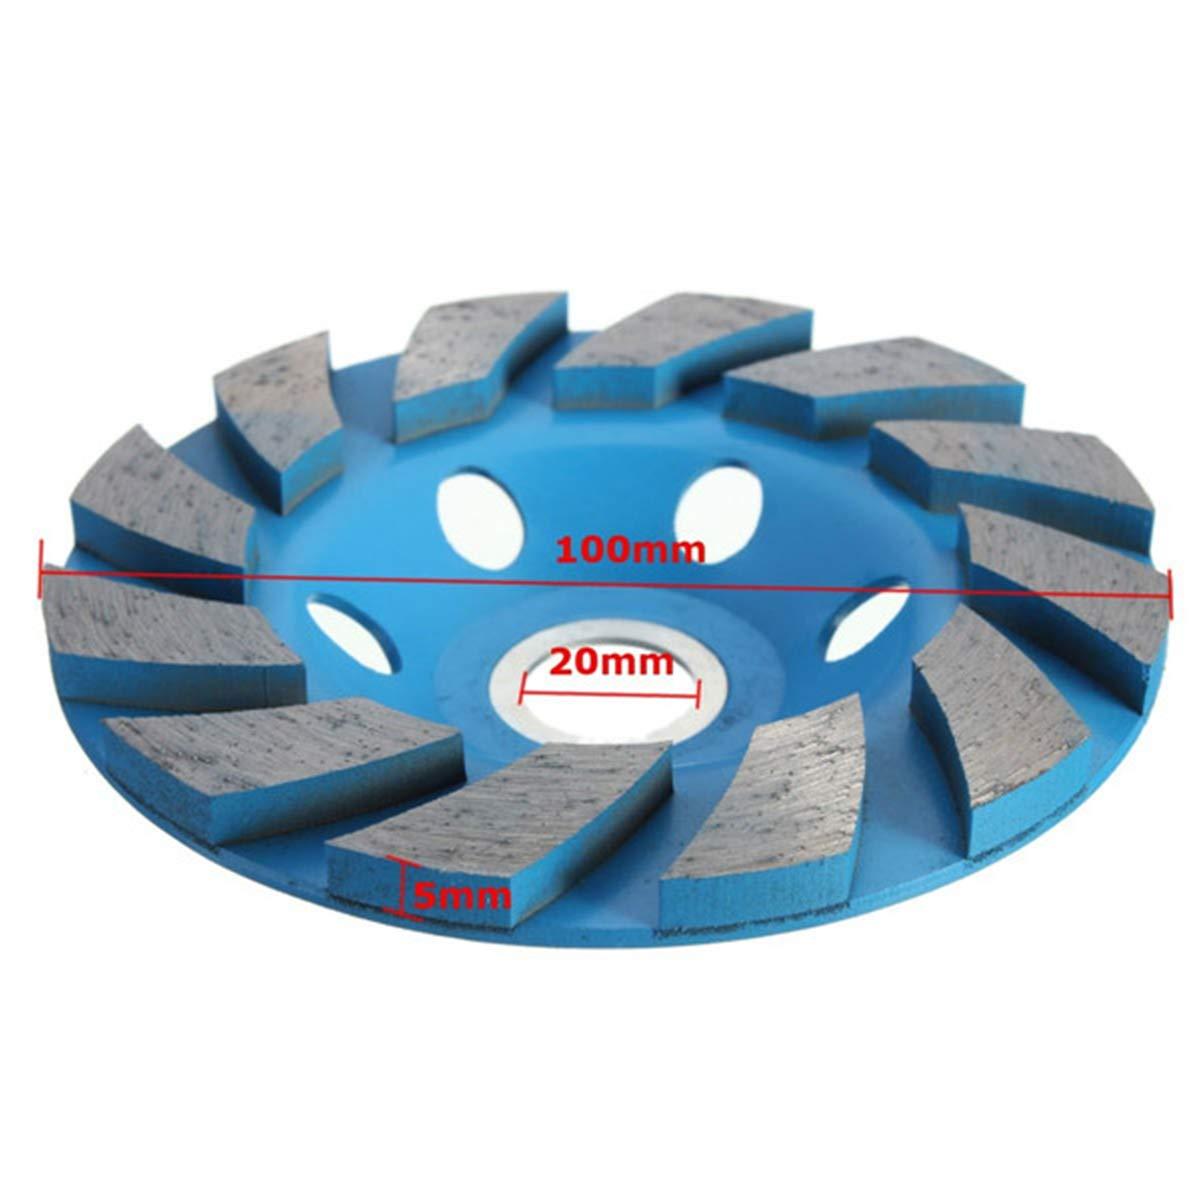 V/ÉZAAR Angle Grinder Segment Grinding Disc Granite Marble Concrete 2PCS 4 Inch Diamond Cup Grinding Wheel